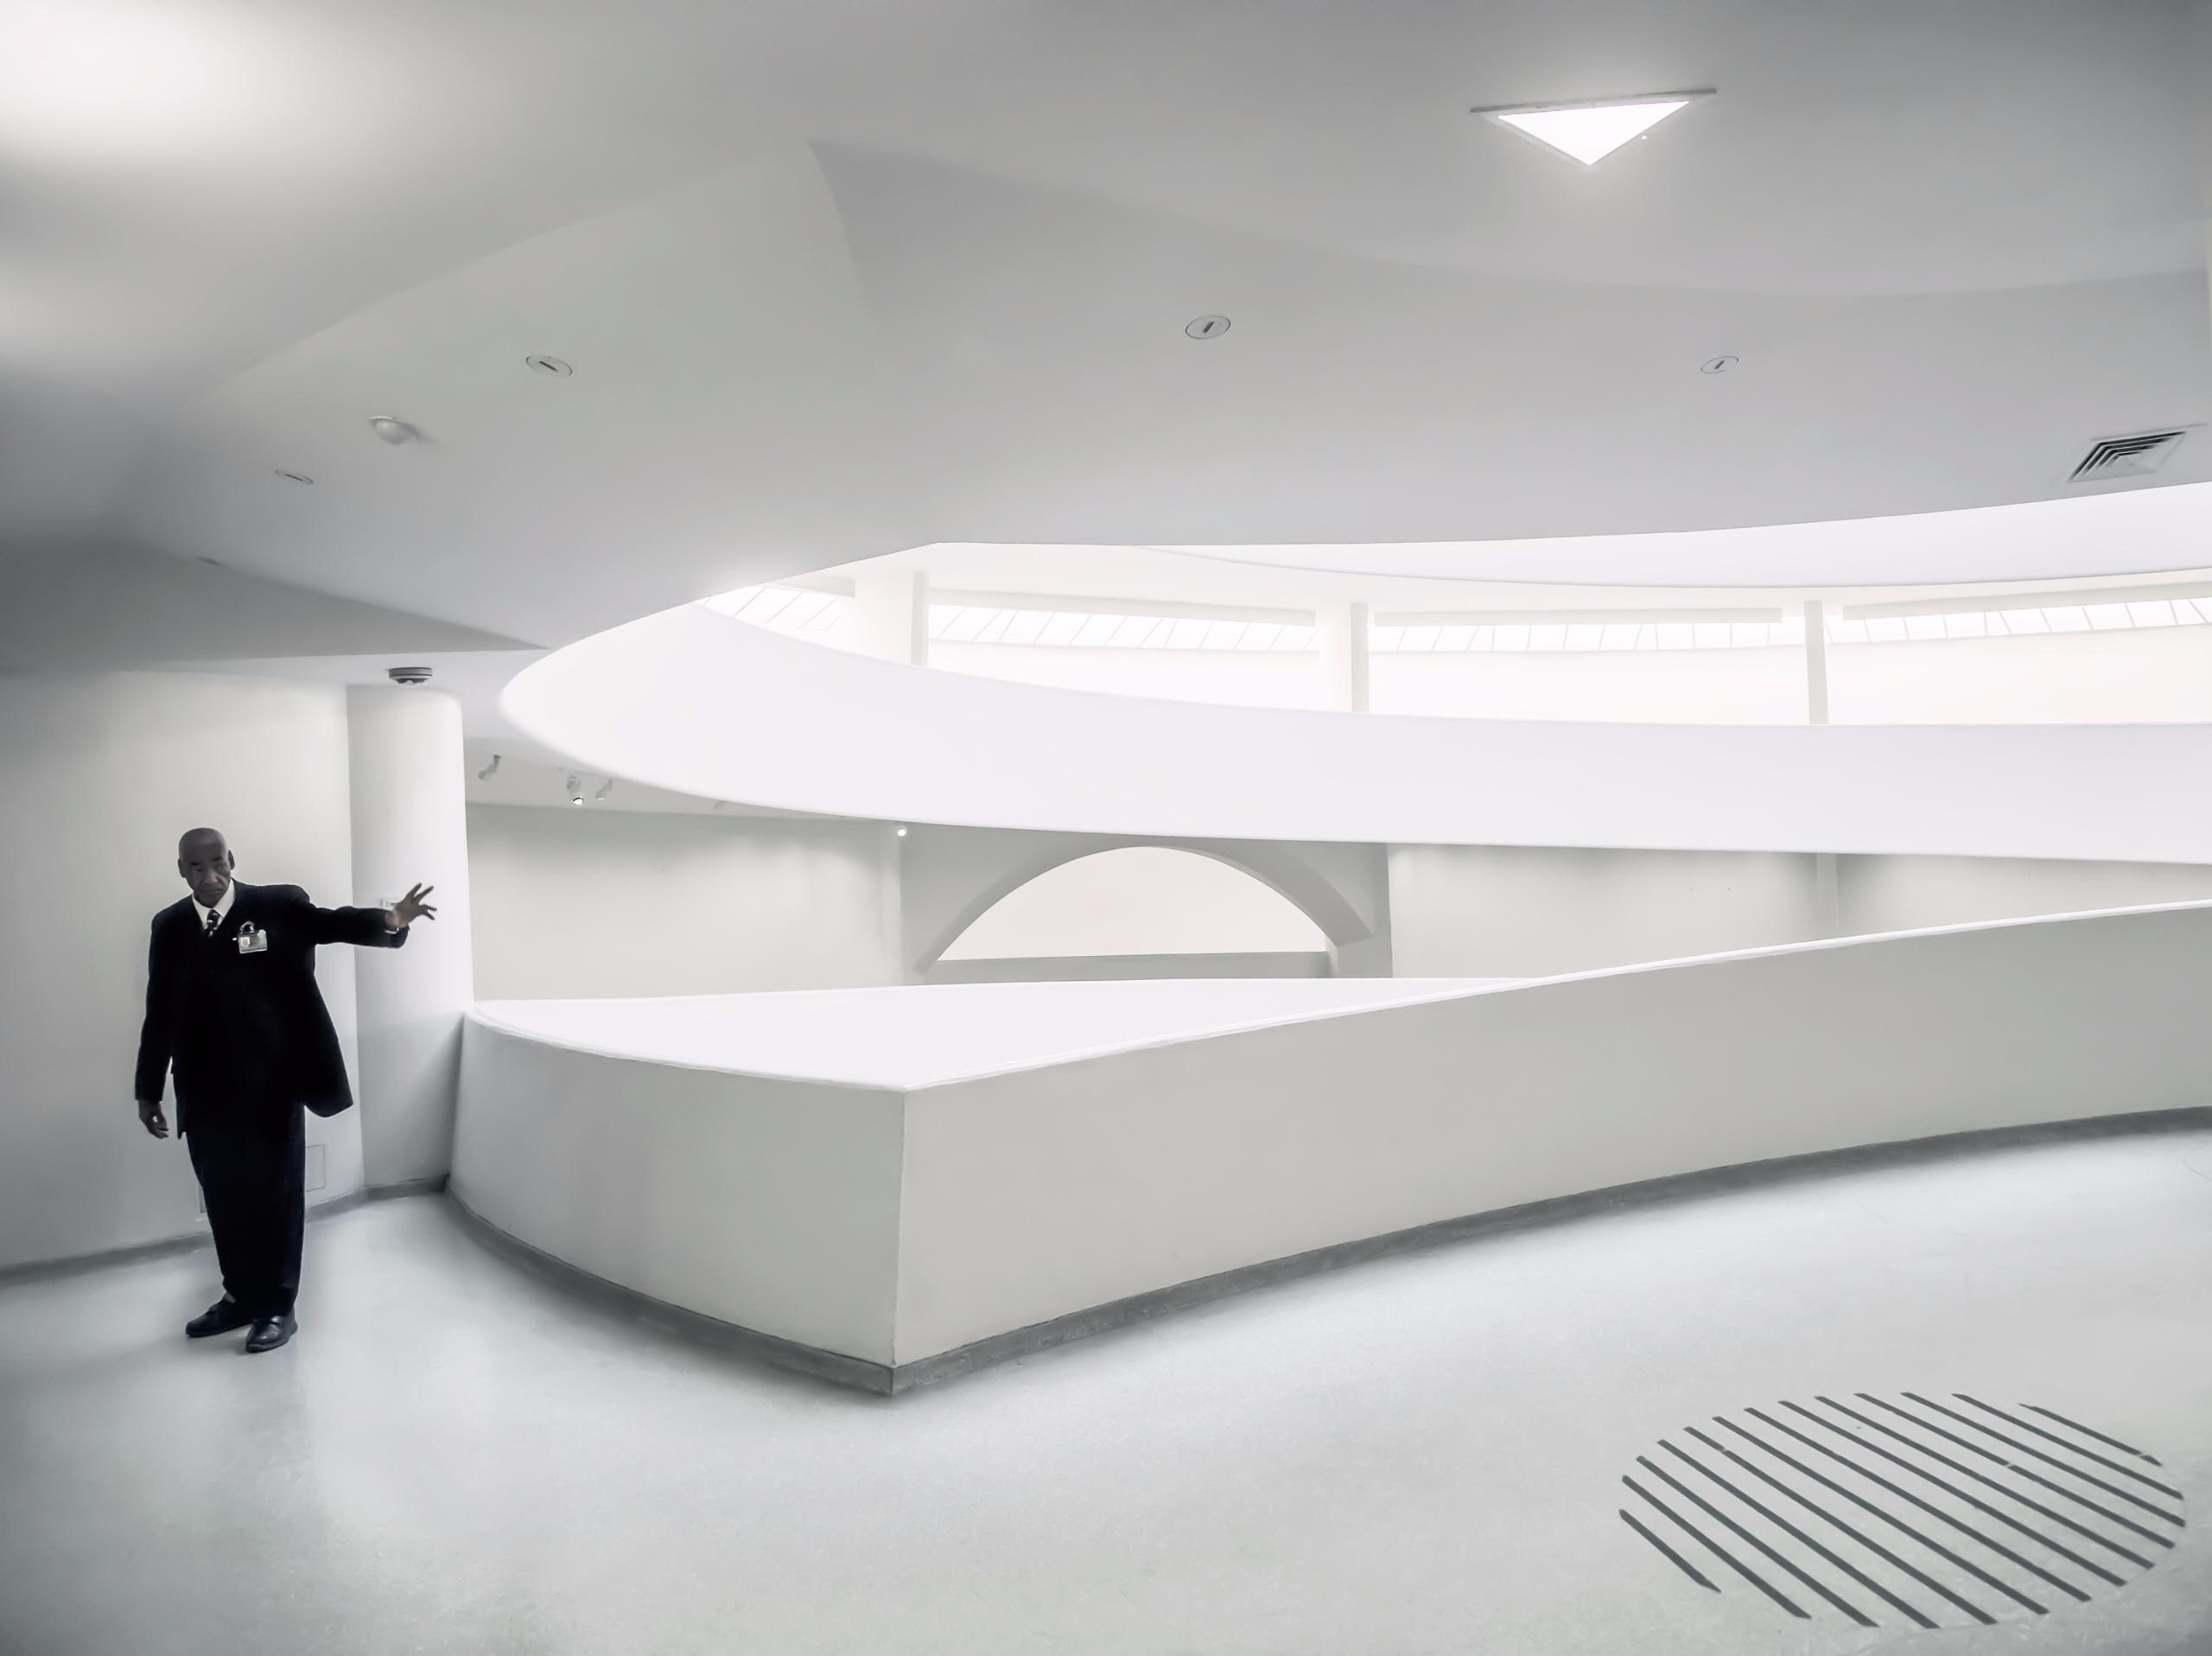 Guggenheim Museum, NYC, January - pajovsky | ello